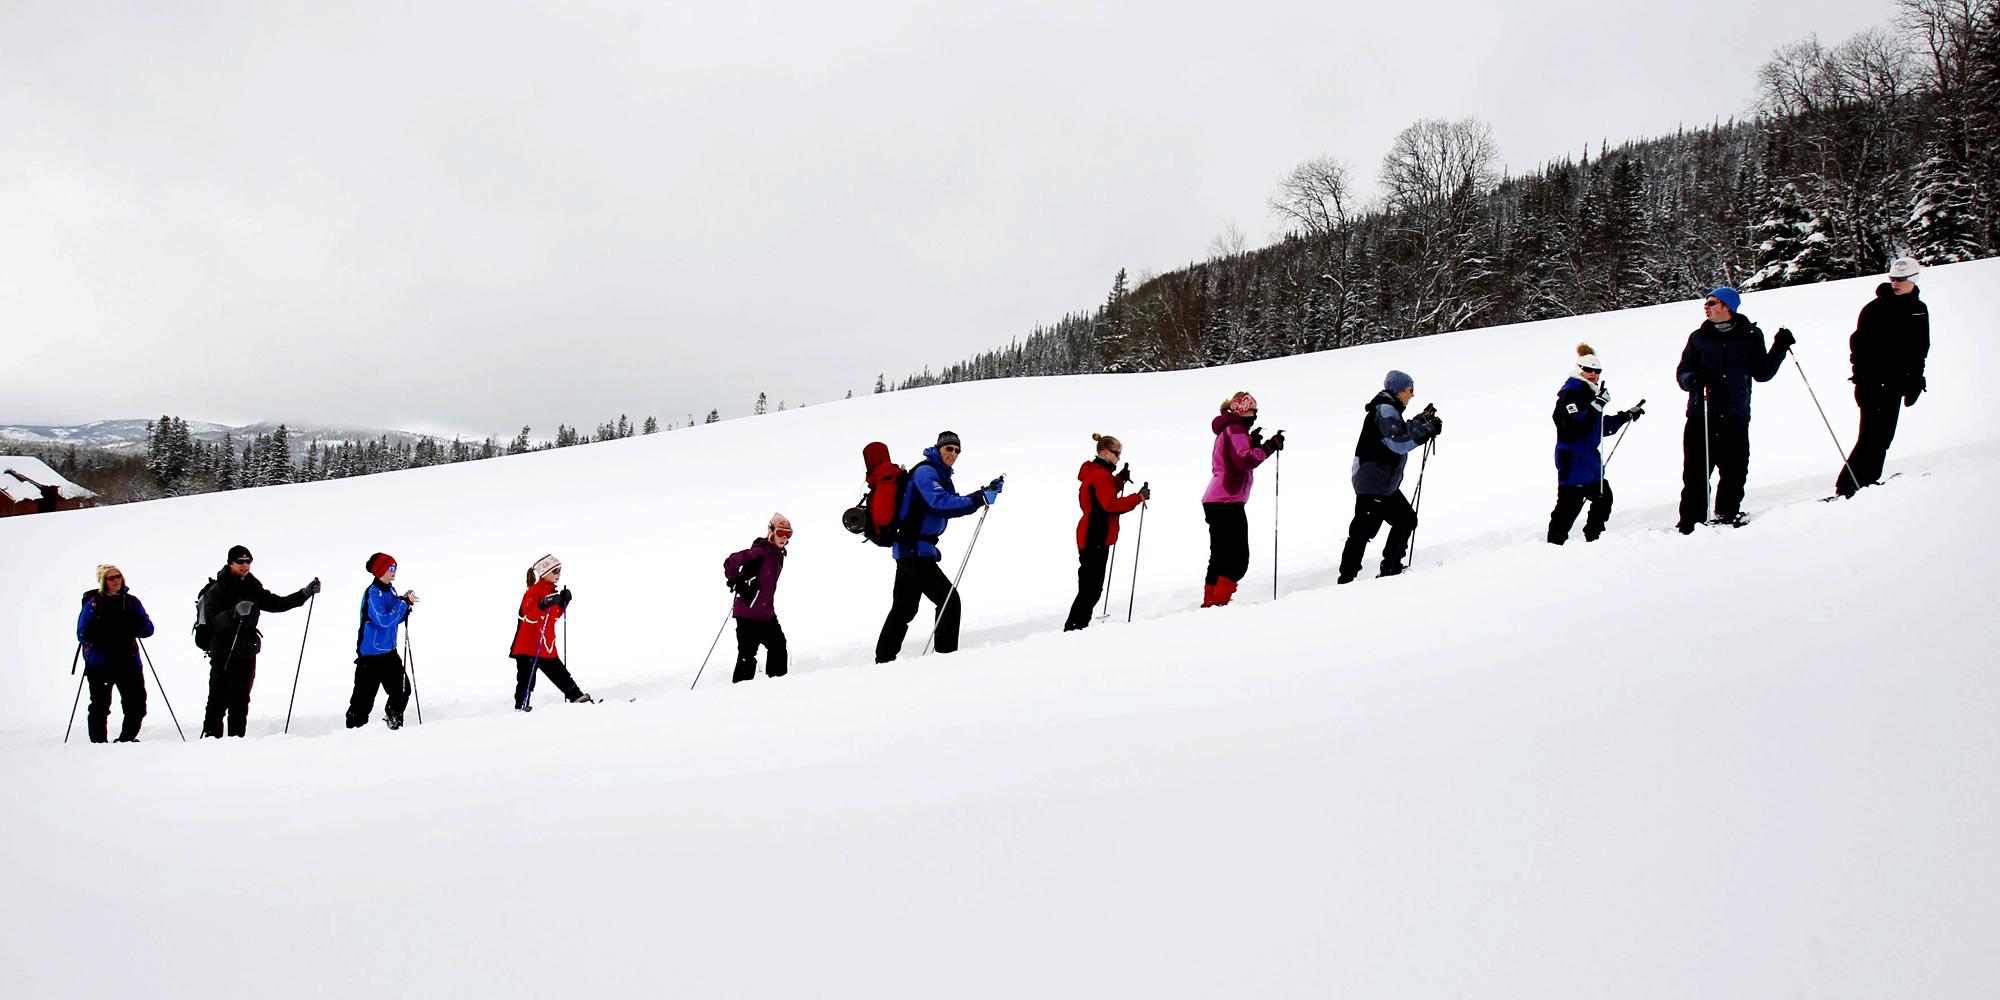 Mokk farm - snowshoeing in a long line. Copyright: Mokk gård